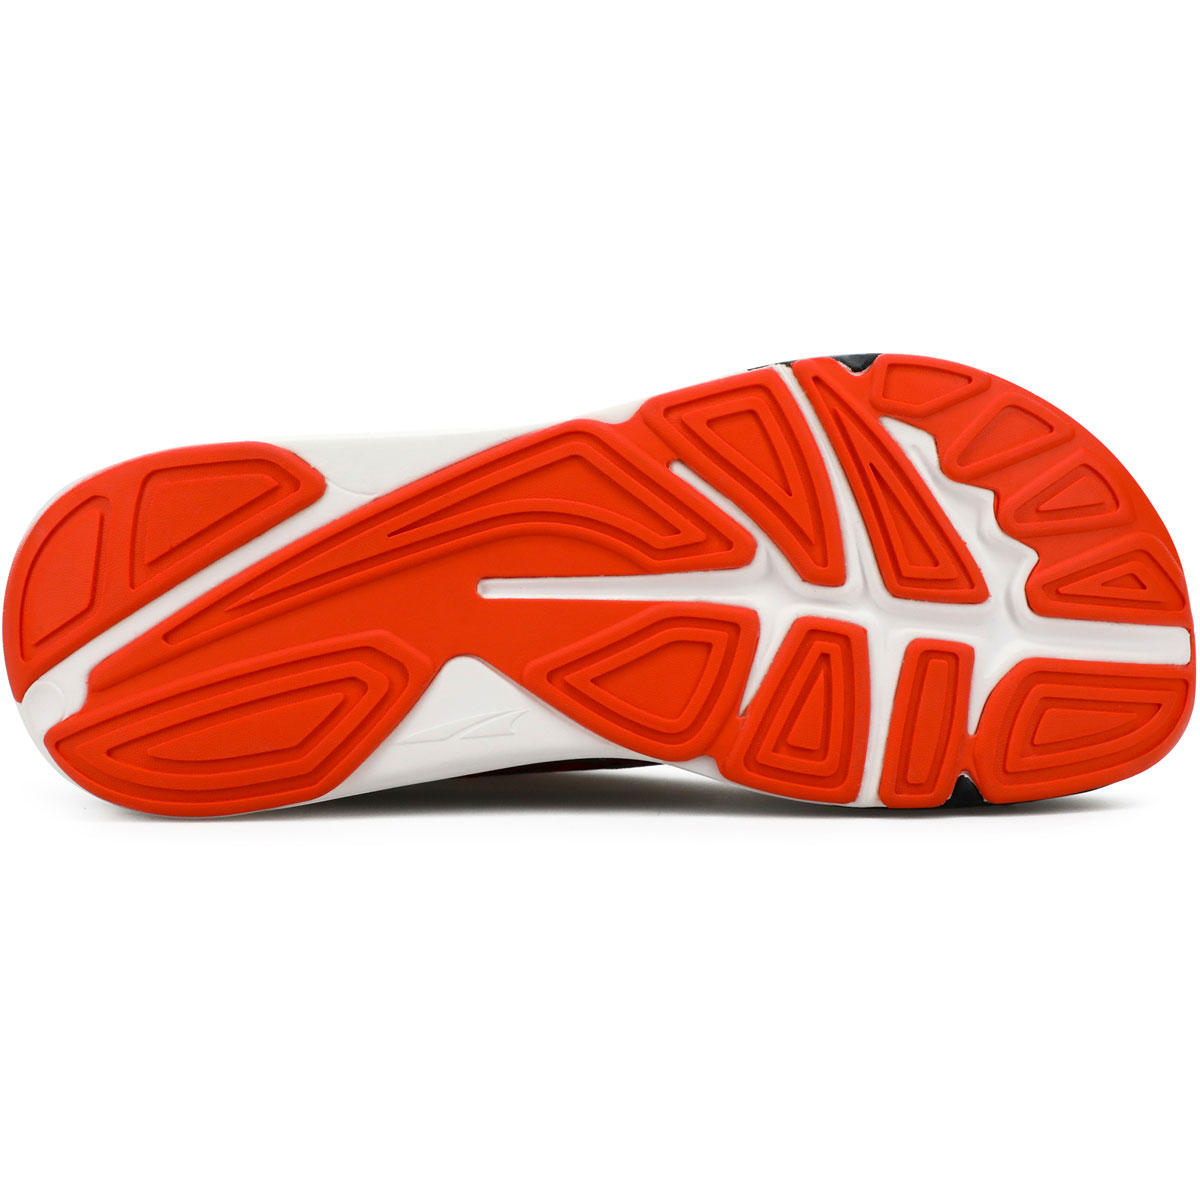 Men's Altra Paradigm 5 Running Shoe - Color: Gray/Orange - Size: 9.5 - Width: Regular, Gray/Orange, large, image 4